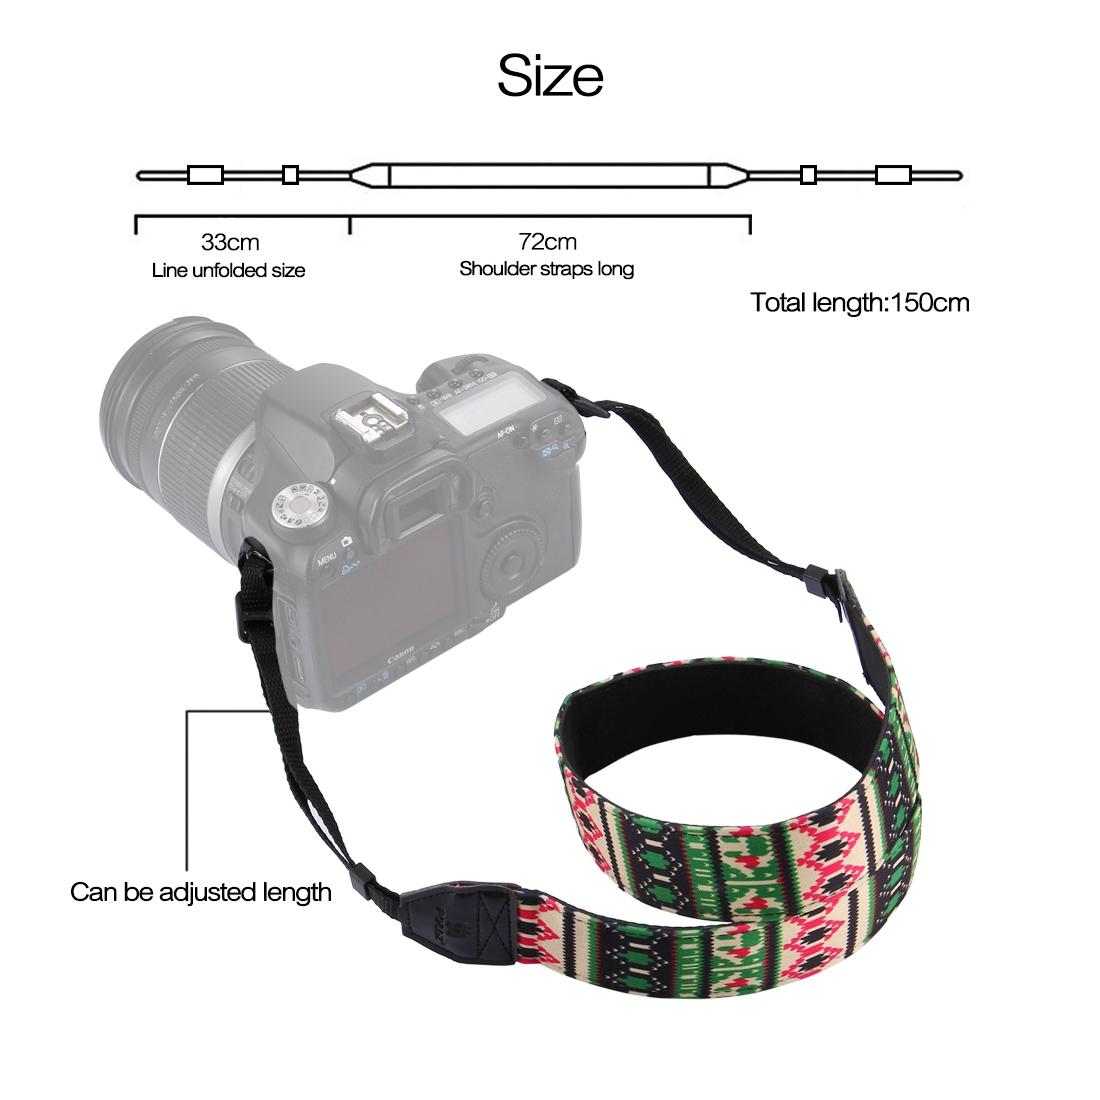 PULUZ PU6007C Retro Ethnic Style Multi-color Series Shoulder Neck Strap Camera Strap for SLR DSLR